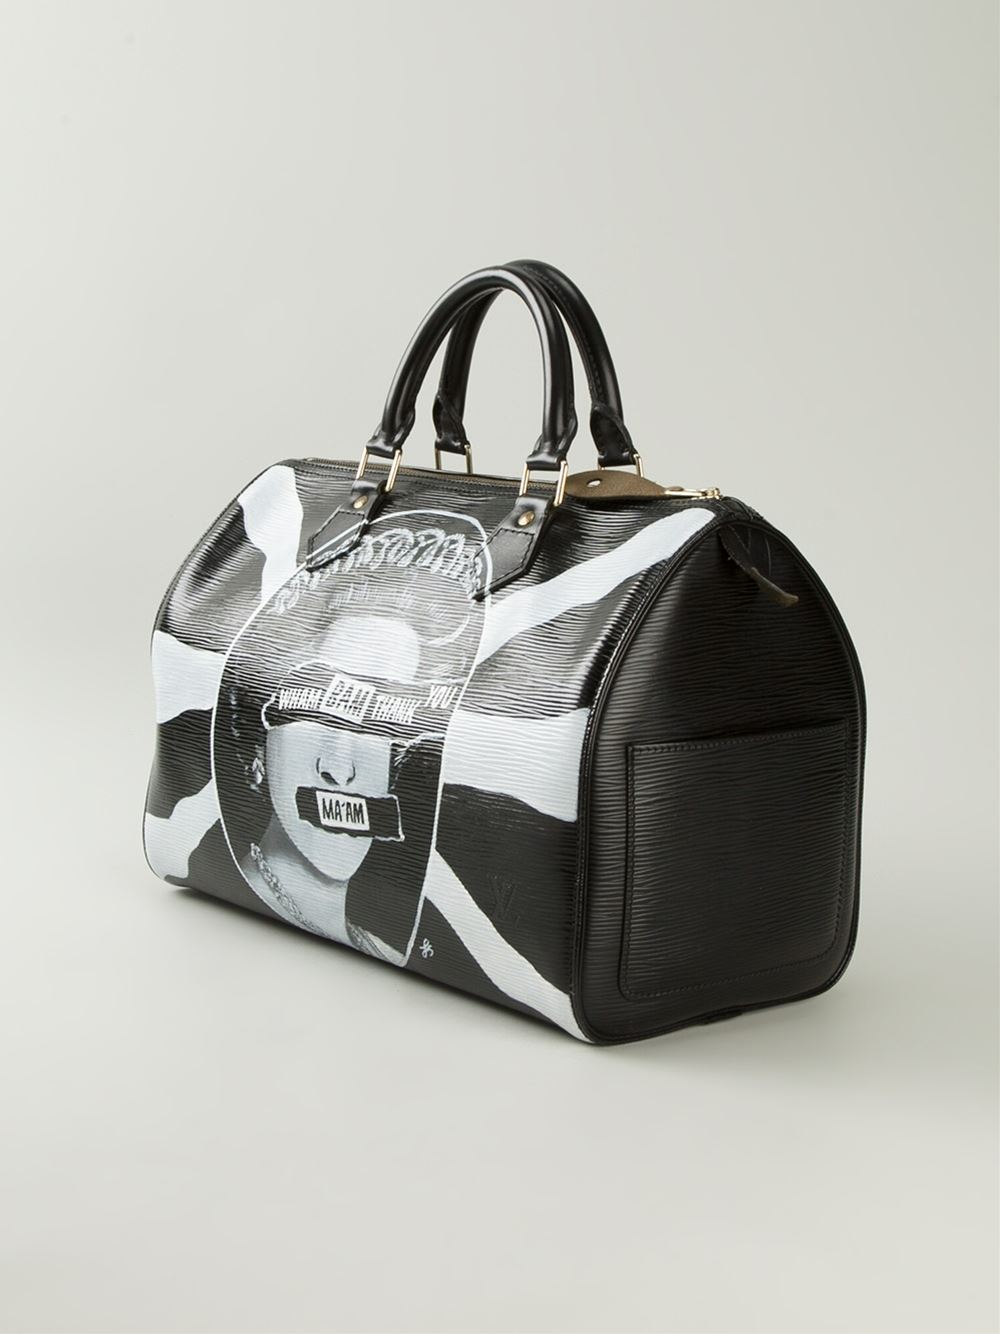 265a0e51a0b221 Louis Vuitton Union Jack Printed Bowling Bag in Black - Lyst